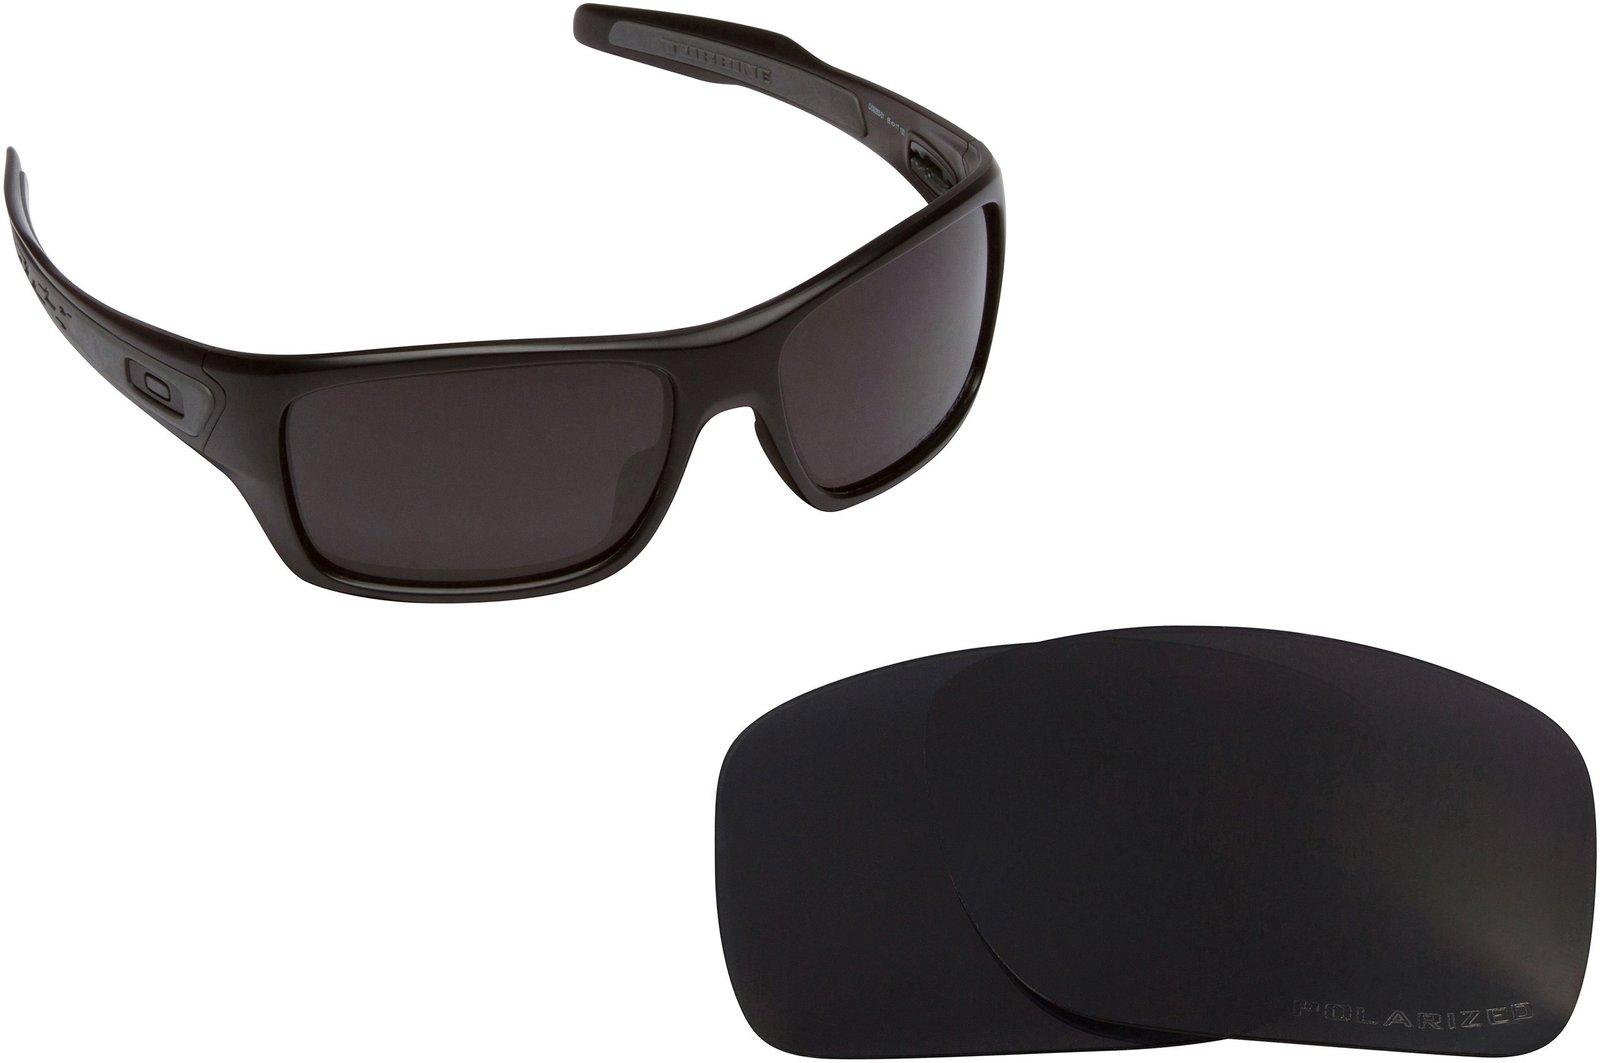 b8dcd807e5bf7 New SEEK Replacement Lenses Oakley TURBINE - Polarized Black Black Iridium